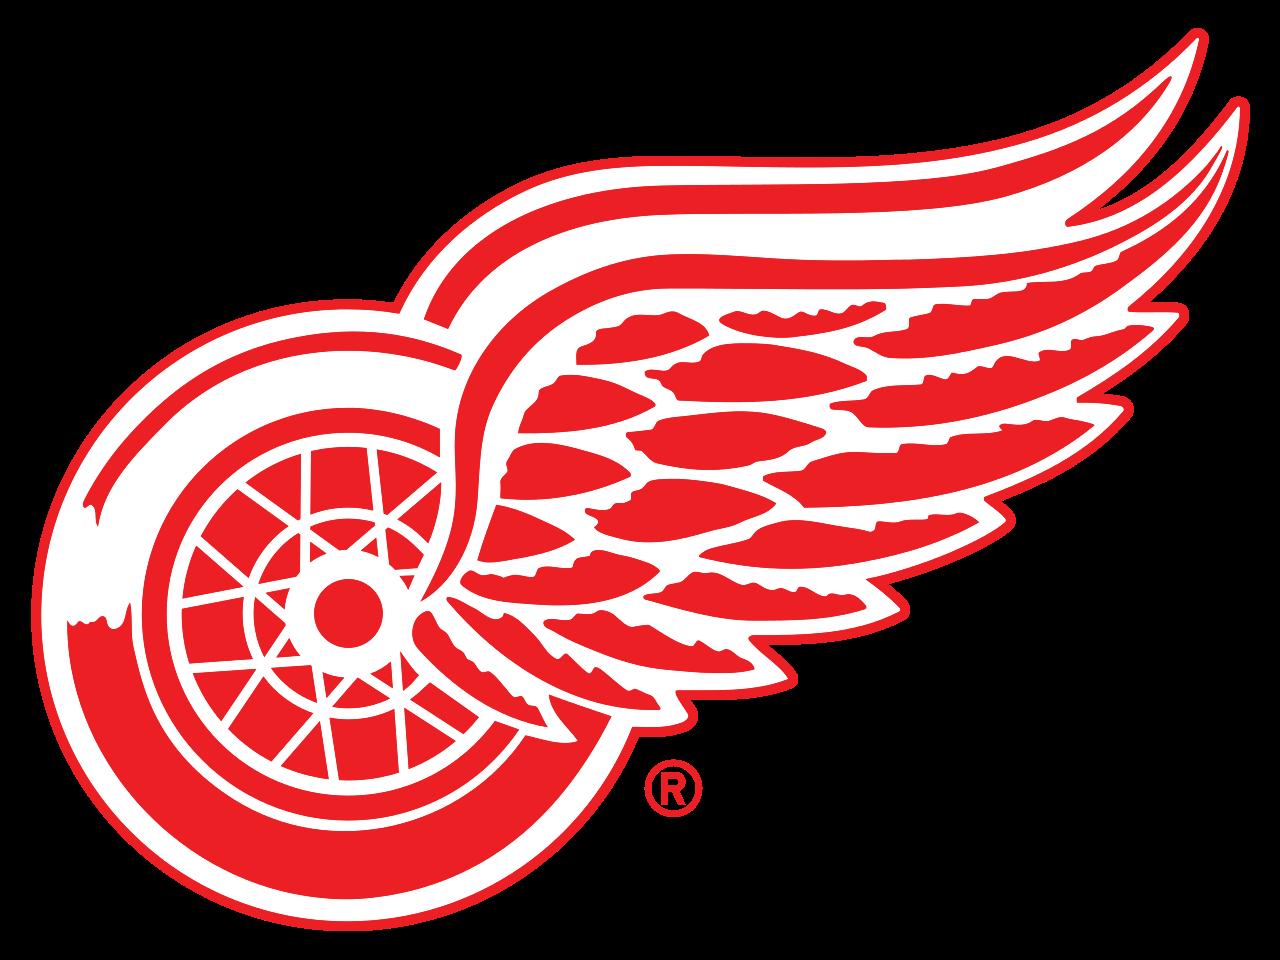 redwings.logo